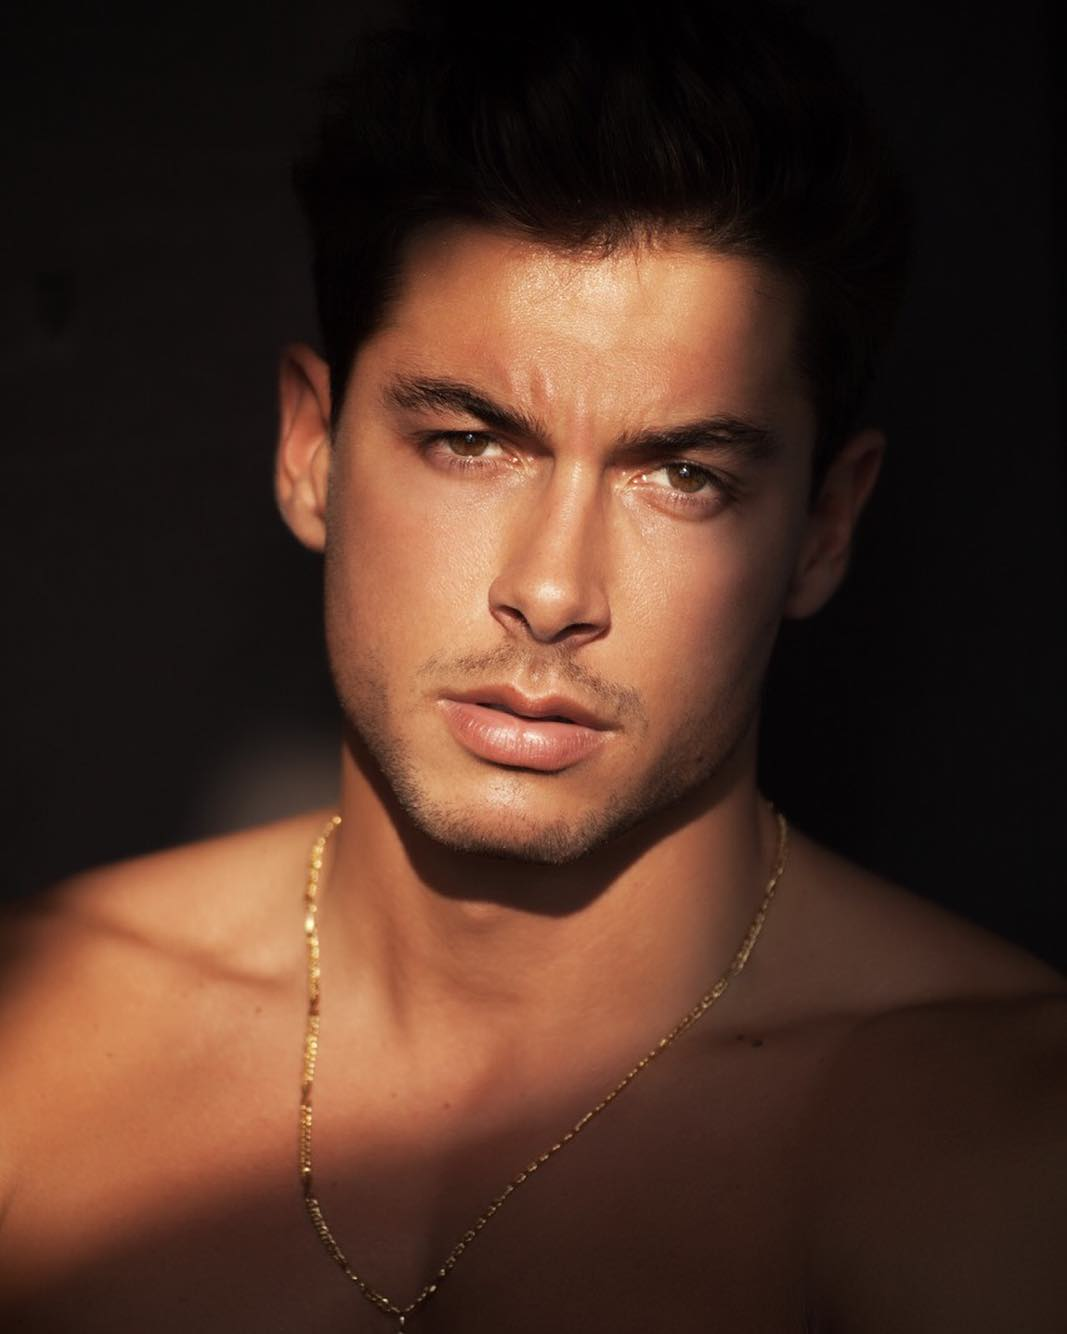 Andrea Denver Gorgeous Gentlemen